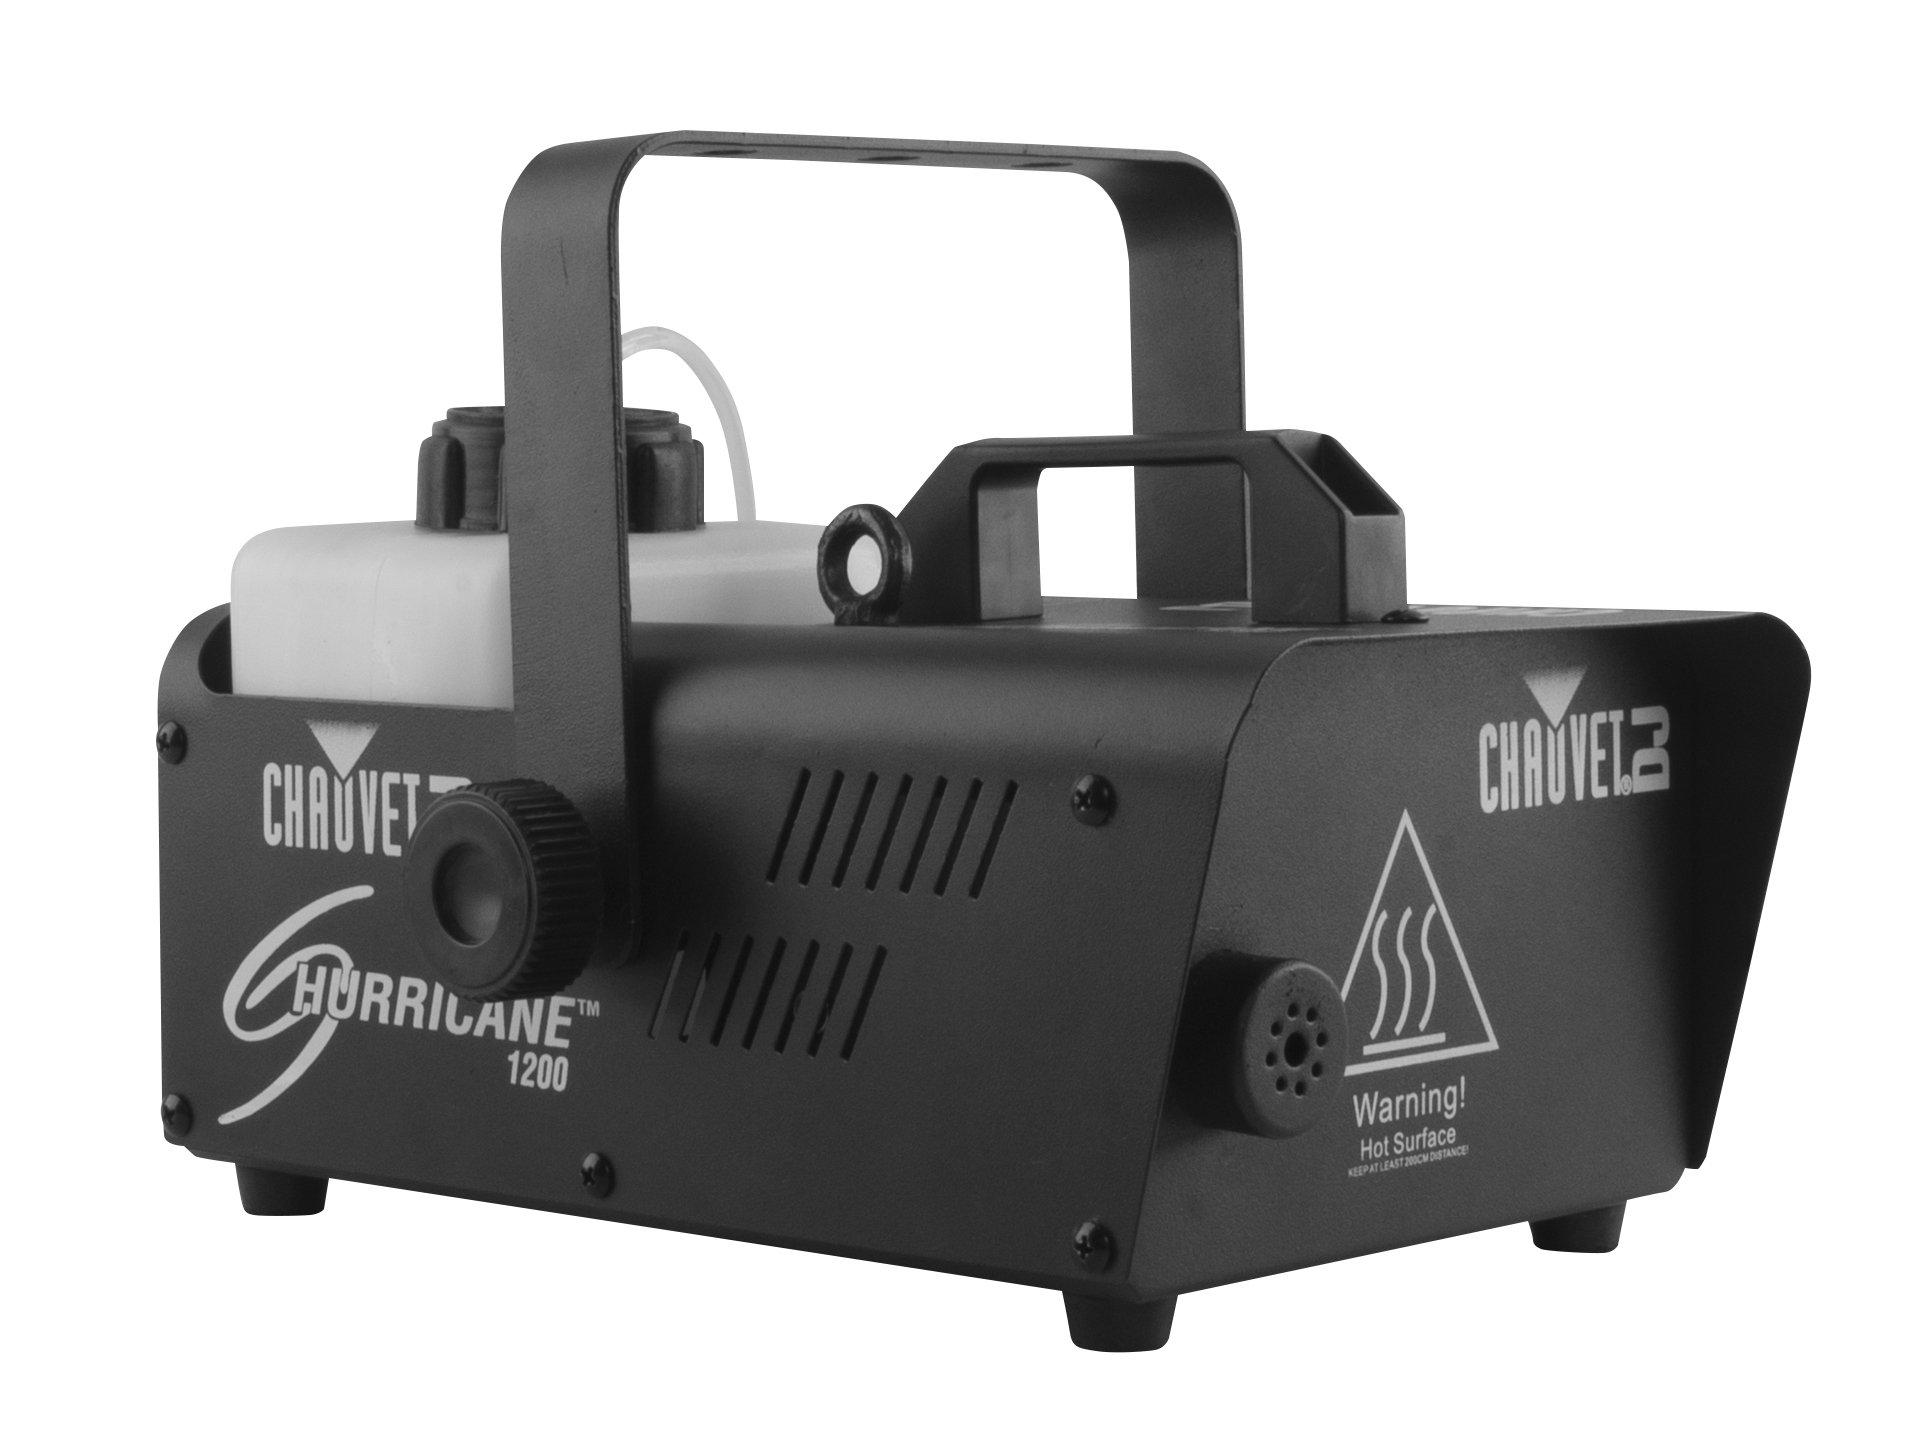 CHAUVET DJ H1200 Compact and Lightweight Fog Machine w/Timer Remote by CHAUVET DJ (Image #1)